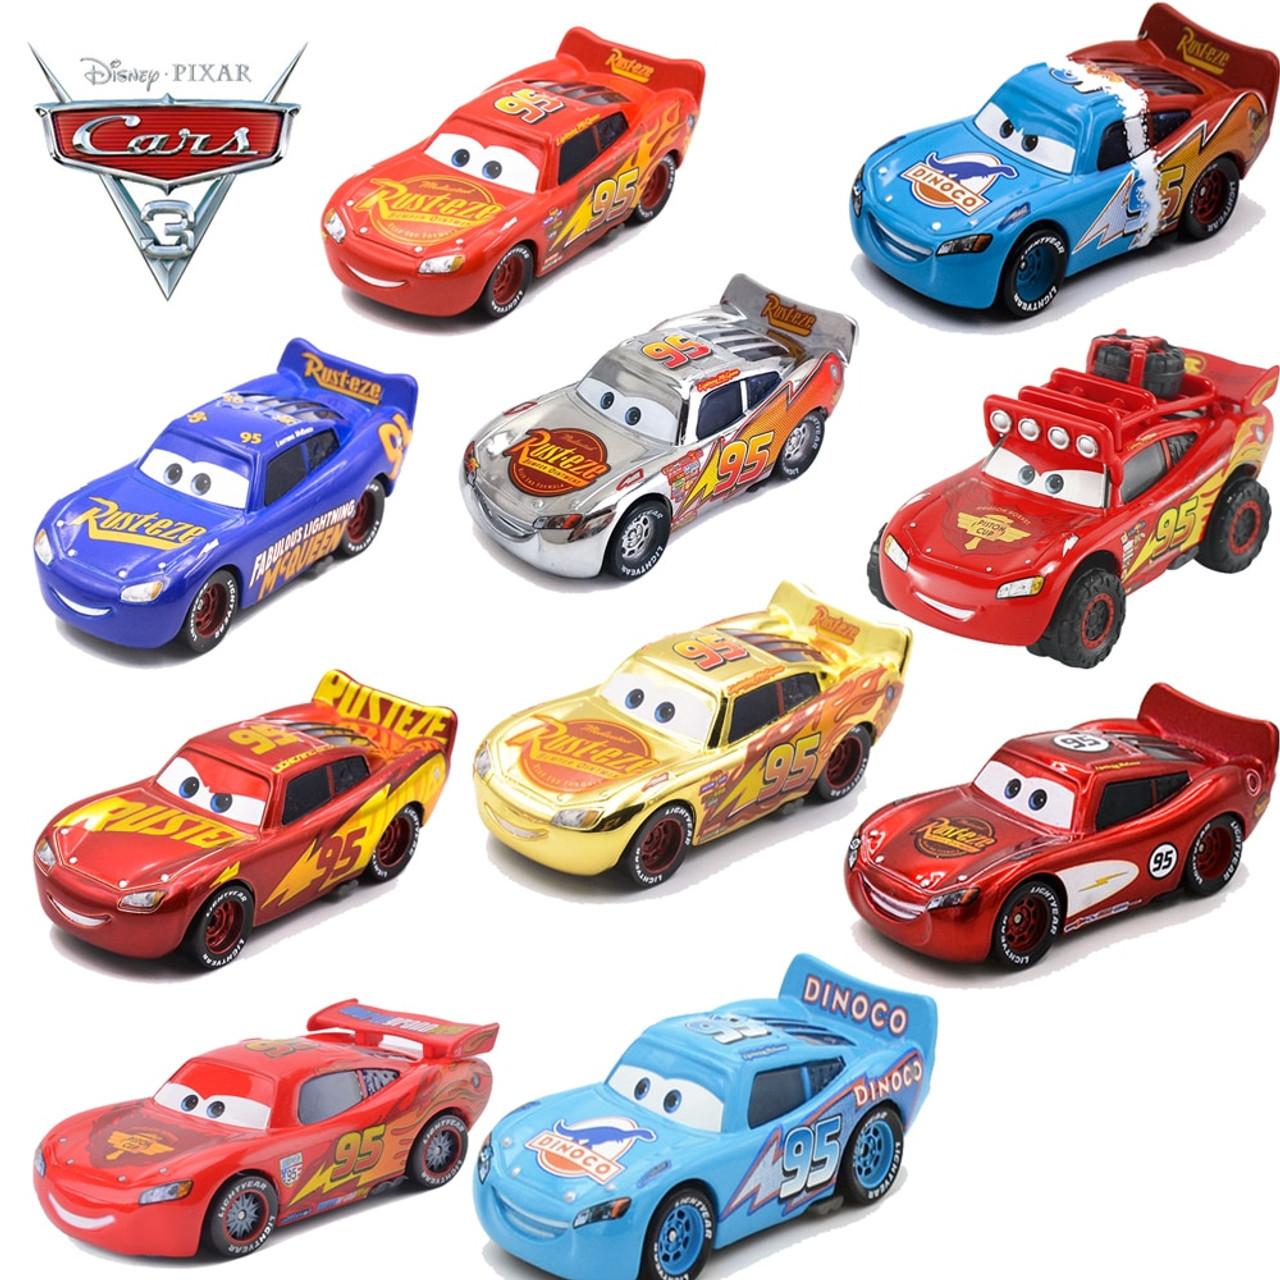 1 55 Disney Pixar Cars Metal Diecast Number 95 Lightning McQueen All Style  Golden Silver Champion Collection Version Car Boy Toy - OnshopDeals.Com a1a17d7d14b3